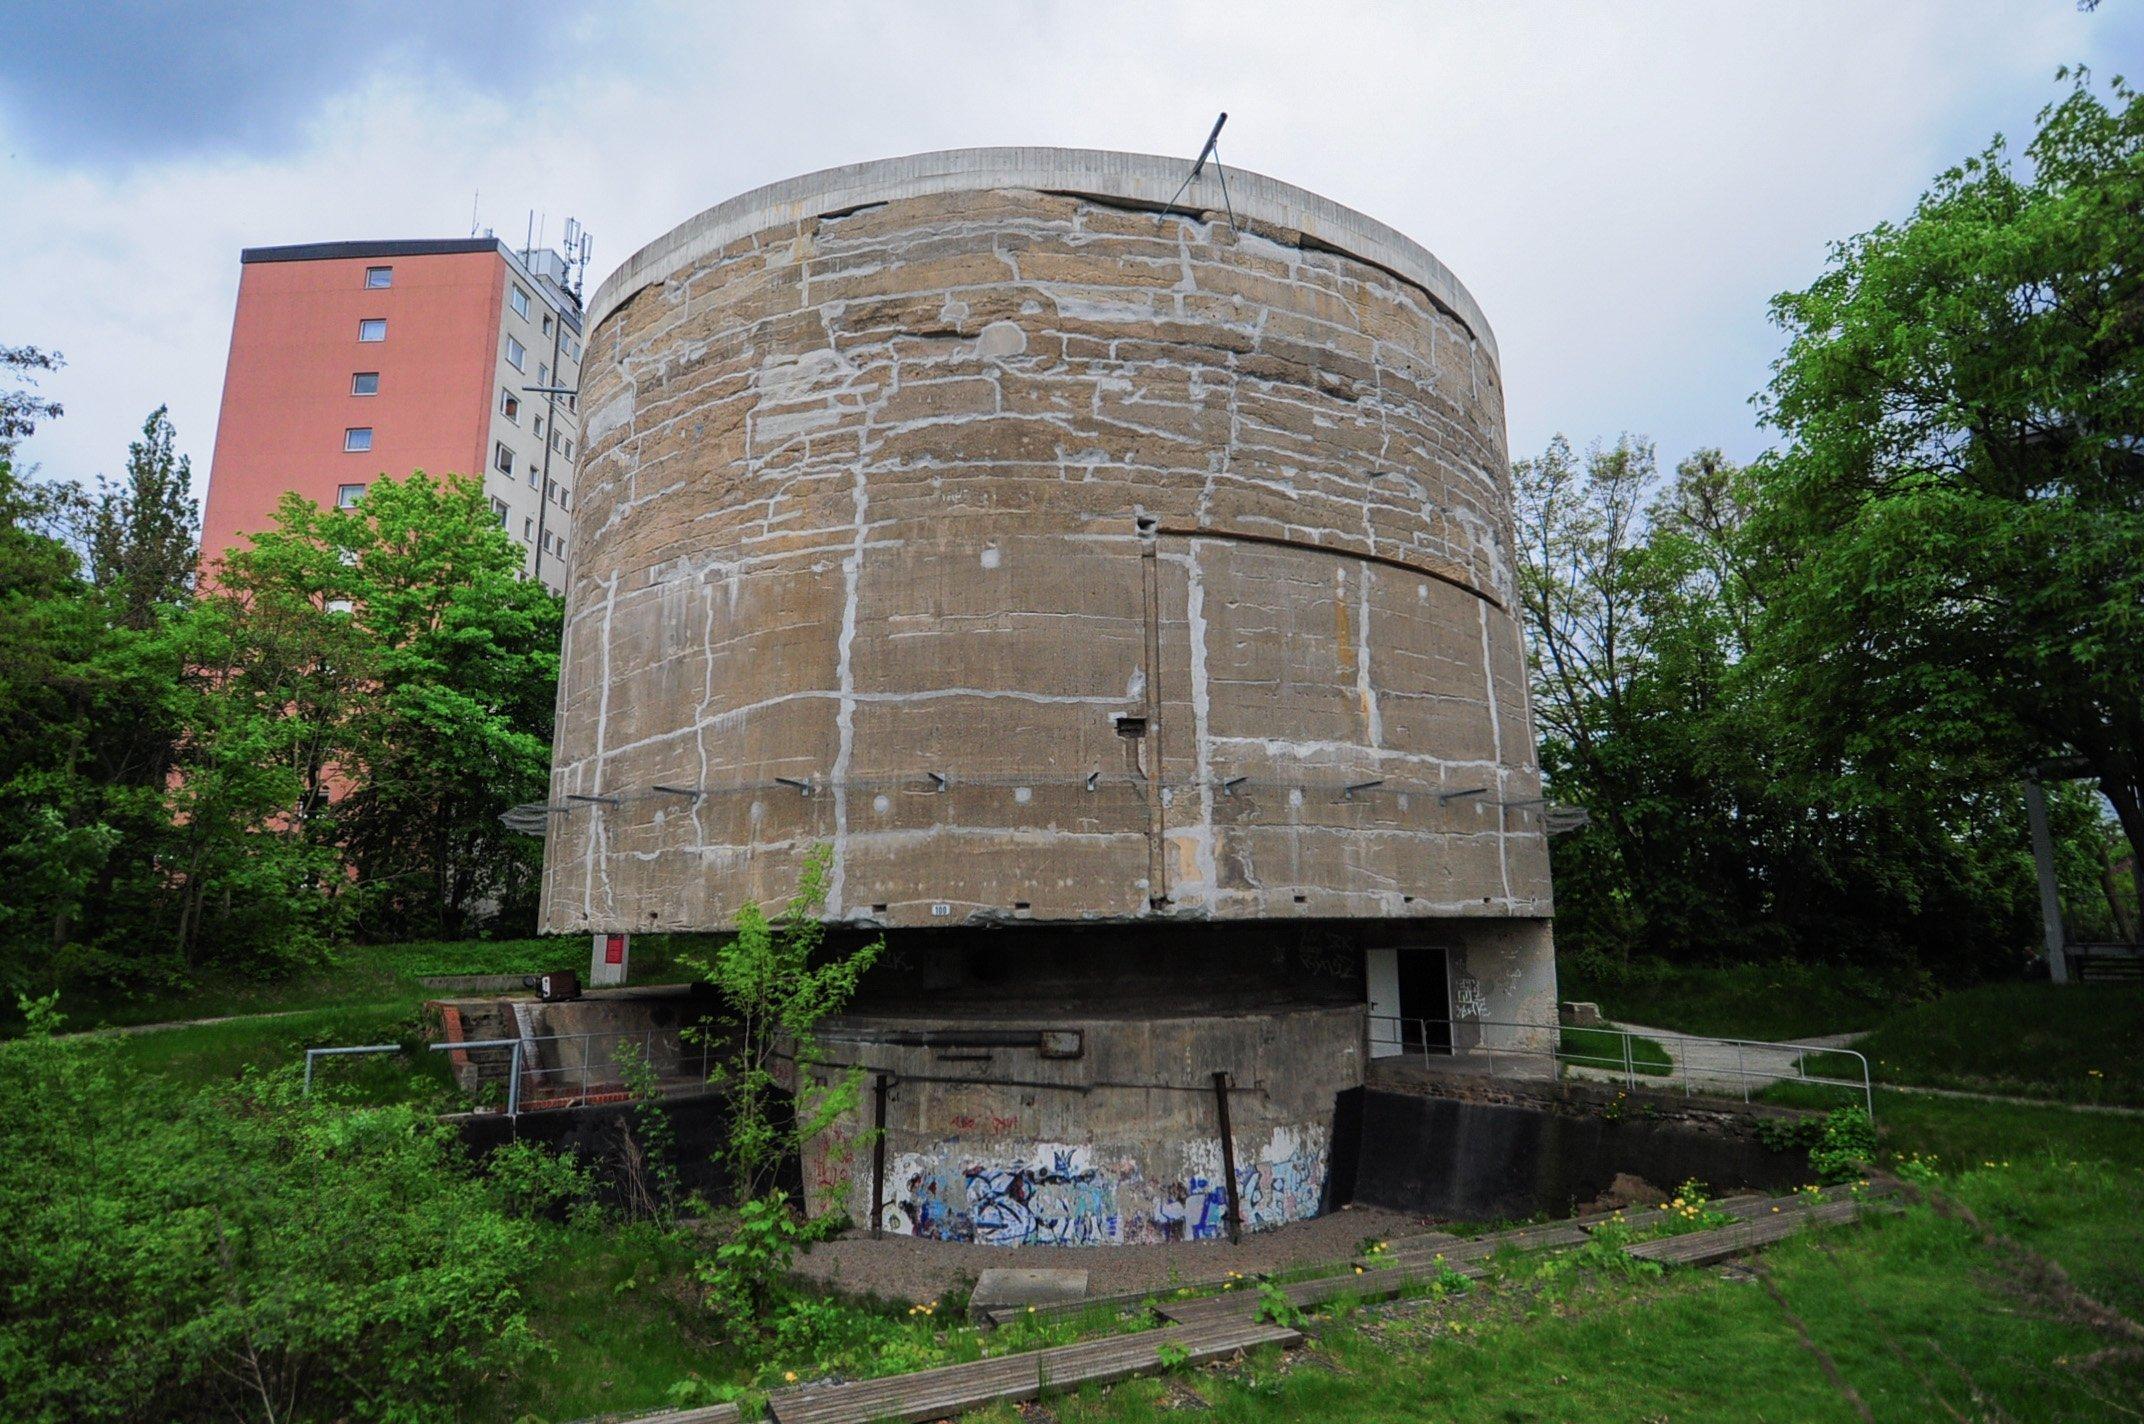 schwerbelastungskörper germania speer nazi tempelhof berlin